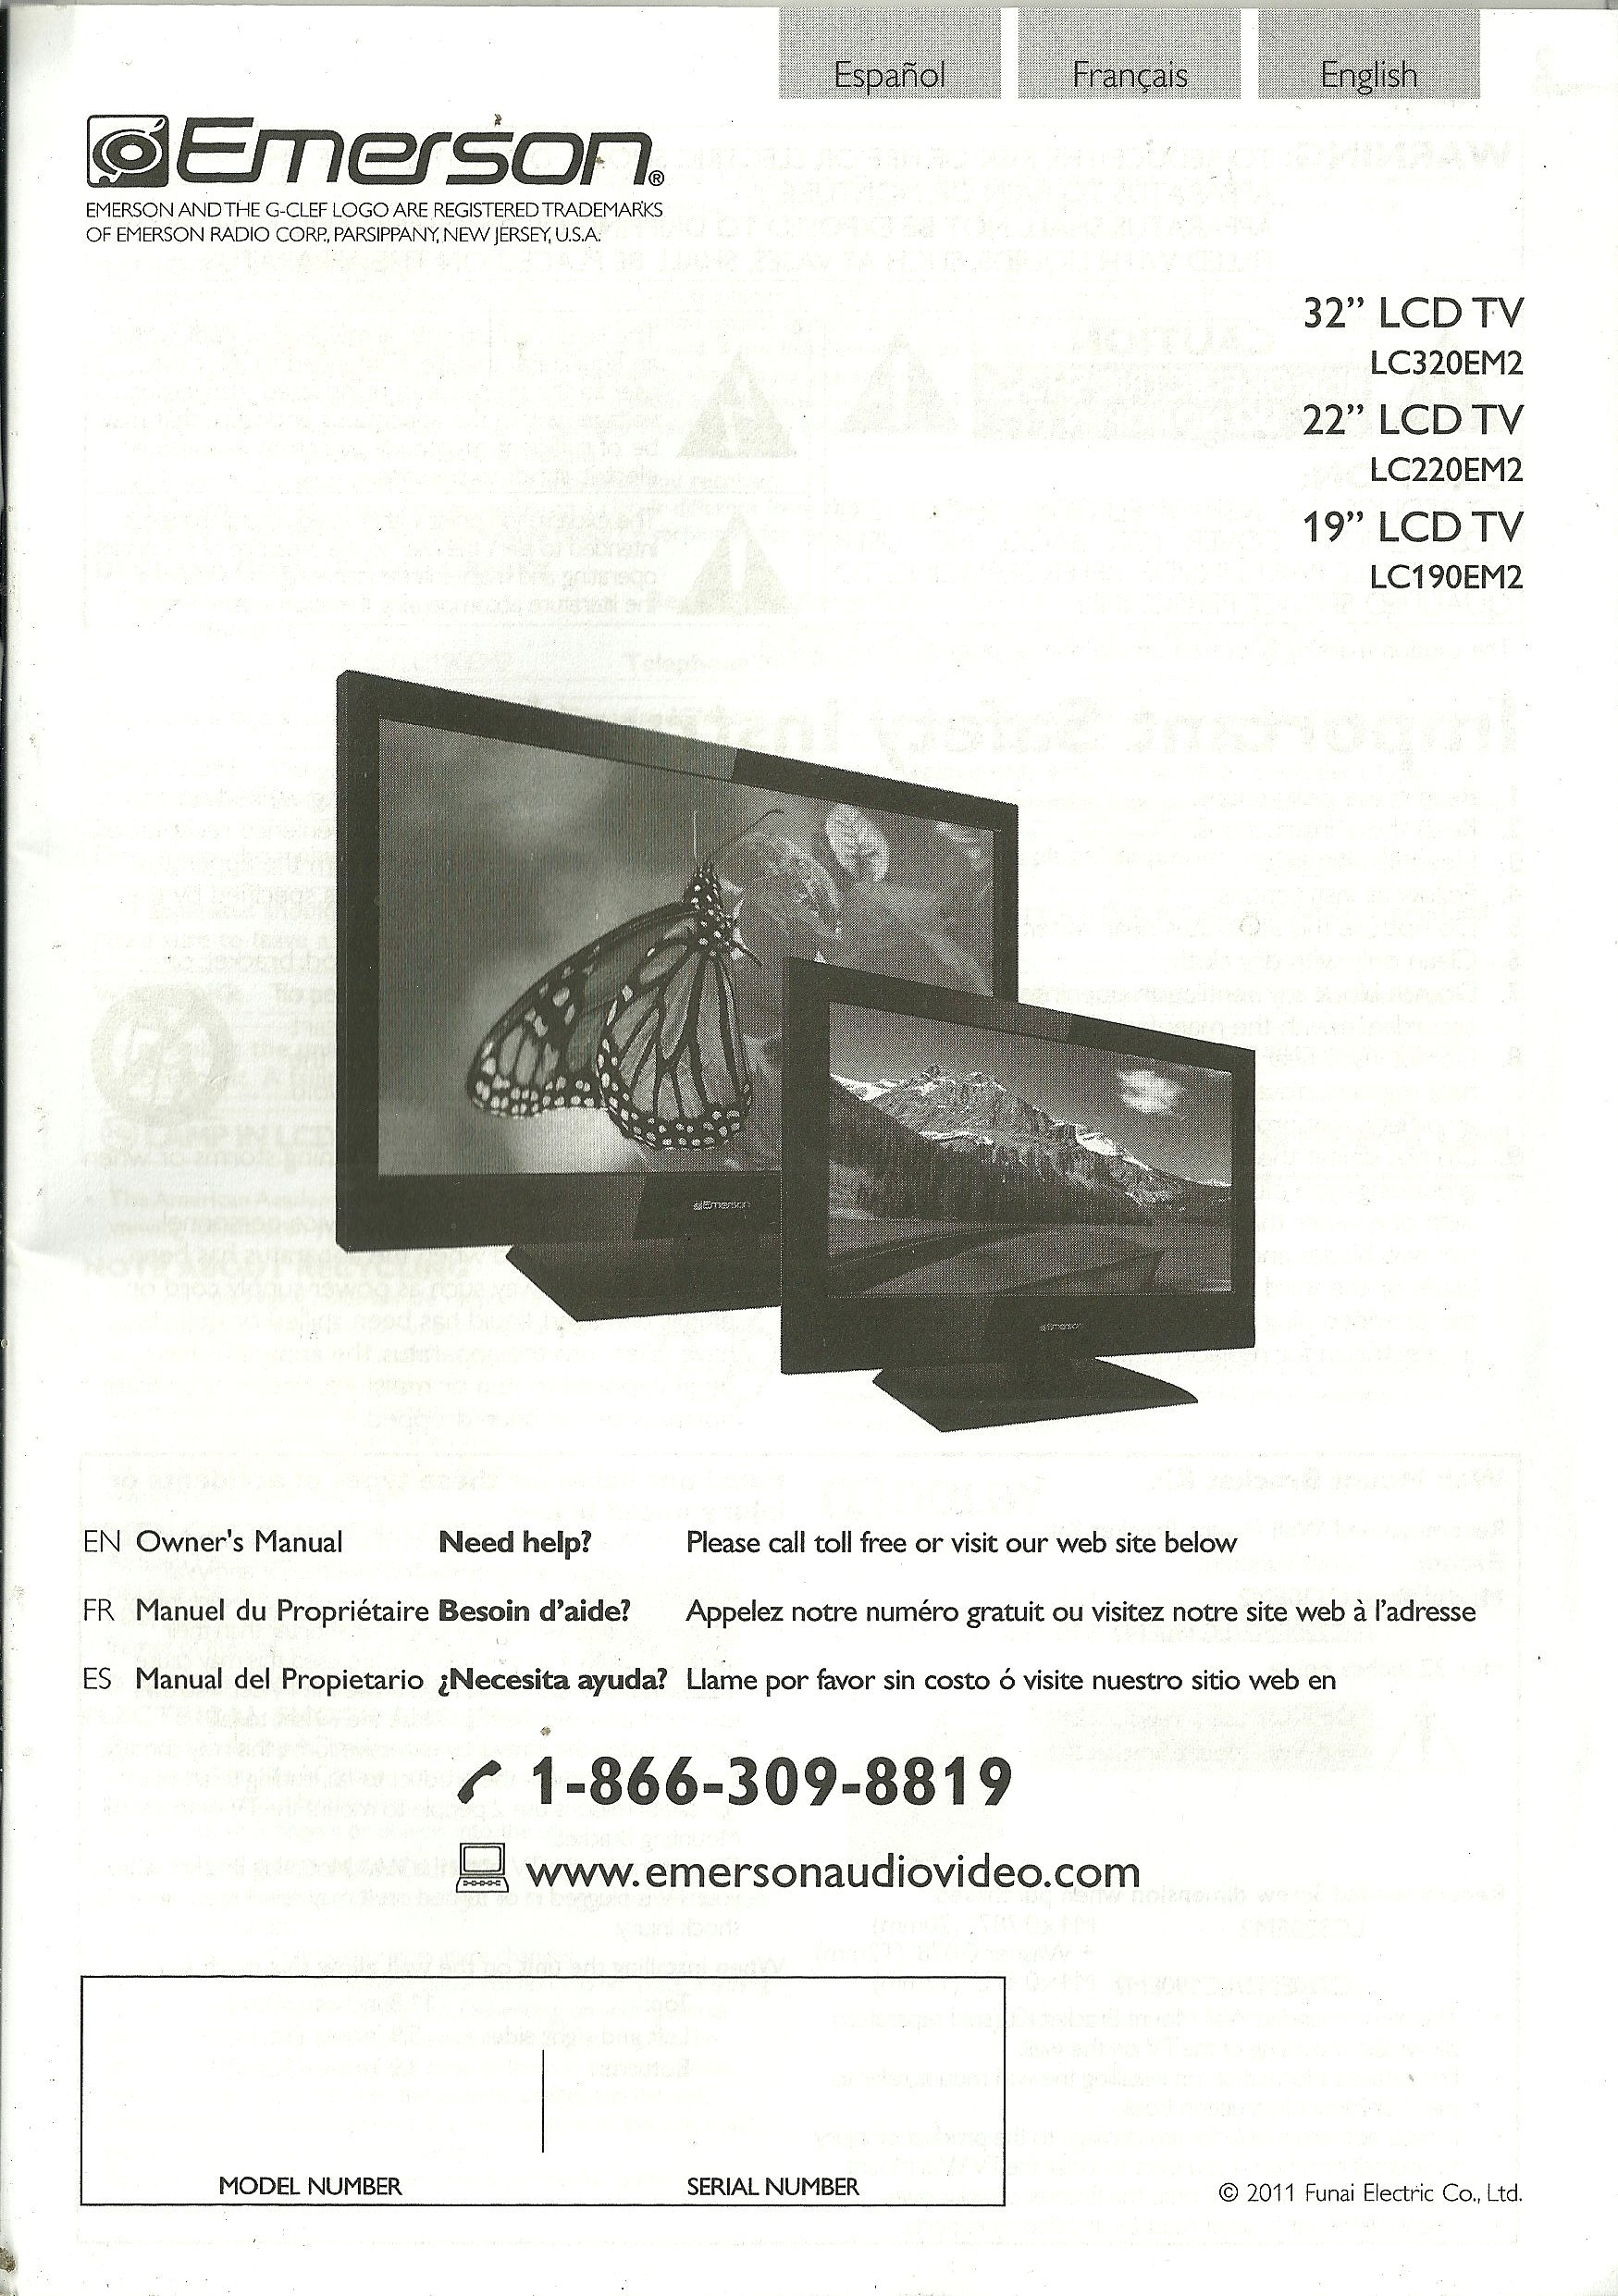 emerson tv owner s manual lc320em2 lc220em2 lc190em2 emerson rh amazon com emerson 32 lcd tv lc320em2 manual Emerson LC320EM2 Service Manual